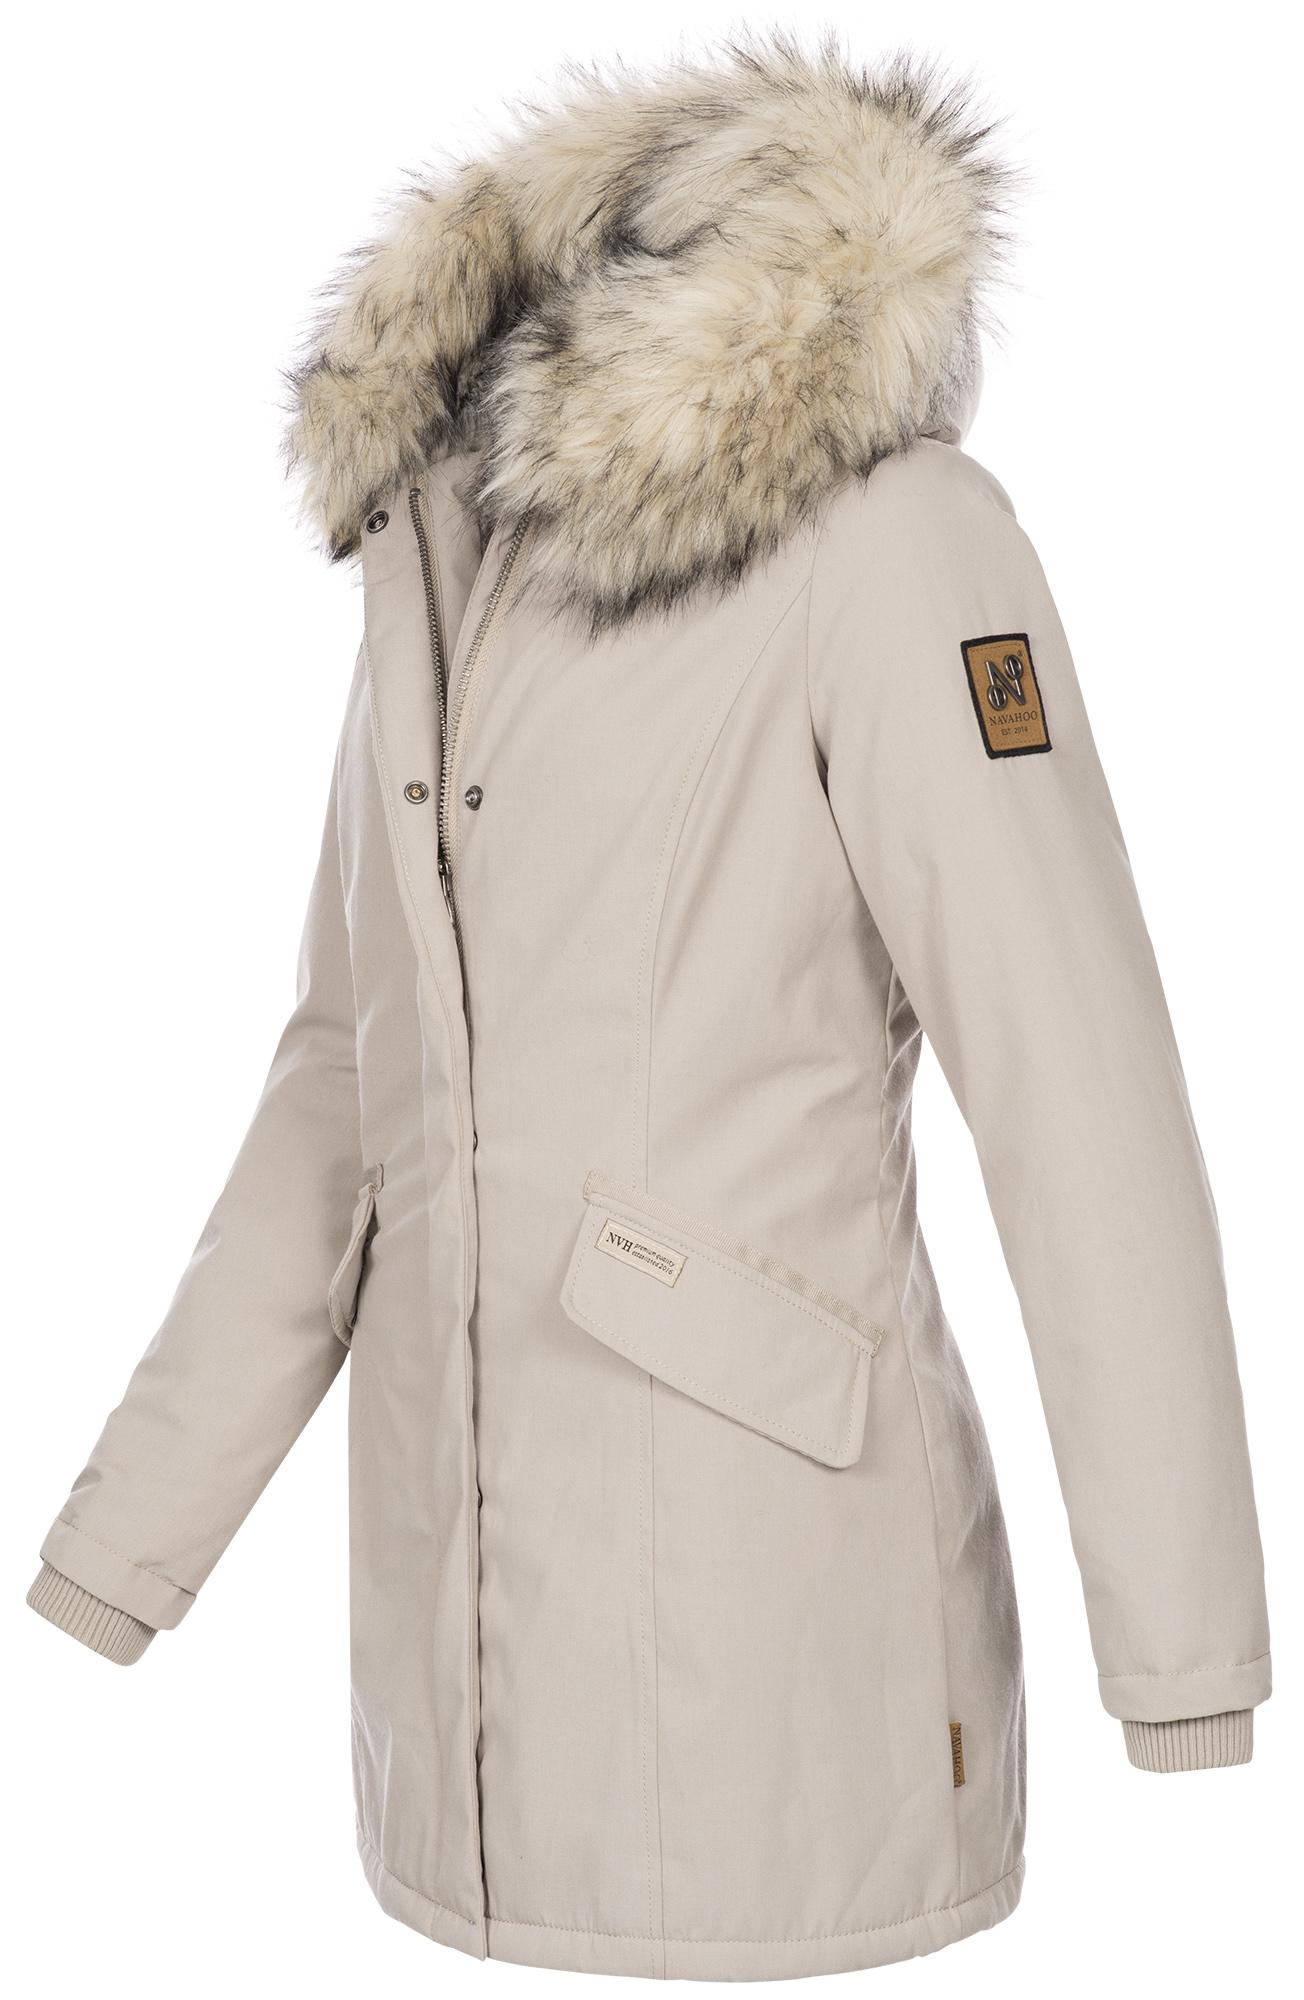 Navahoo-Premium-Damen-Winter-Jacke-Parka-Mantel-Winterjacke-warm-Kunstfell-B669 Indexbild 22